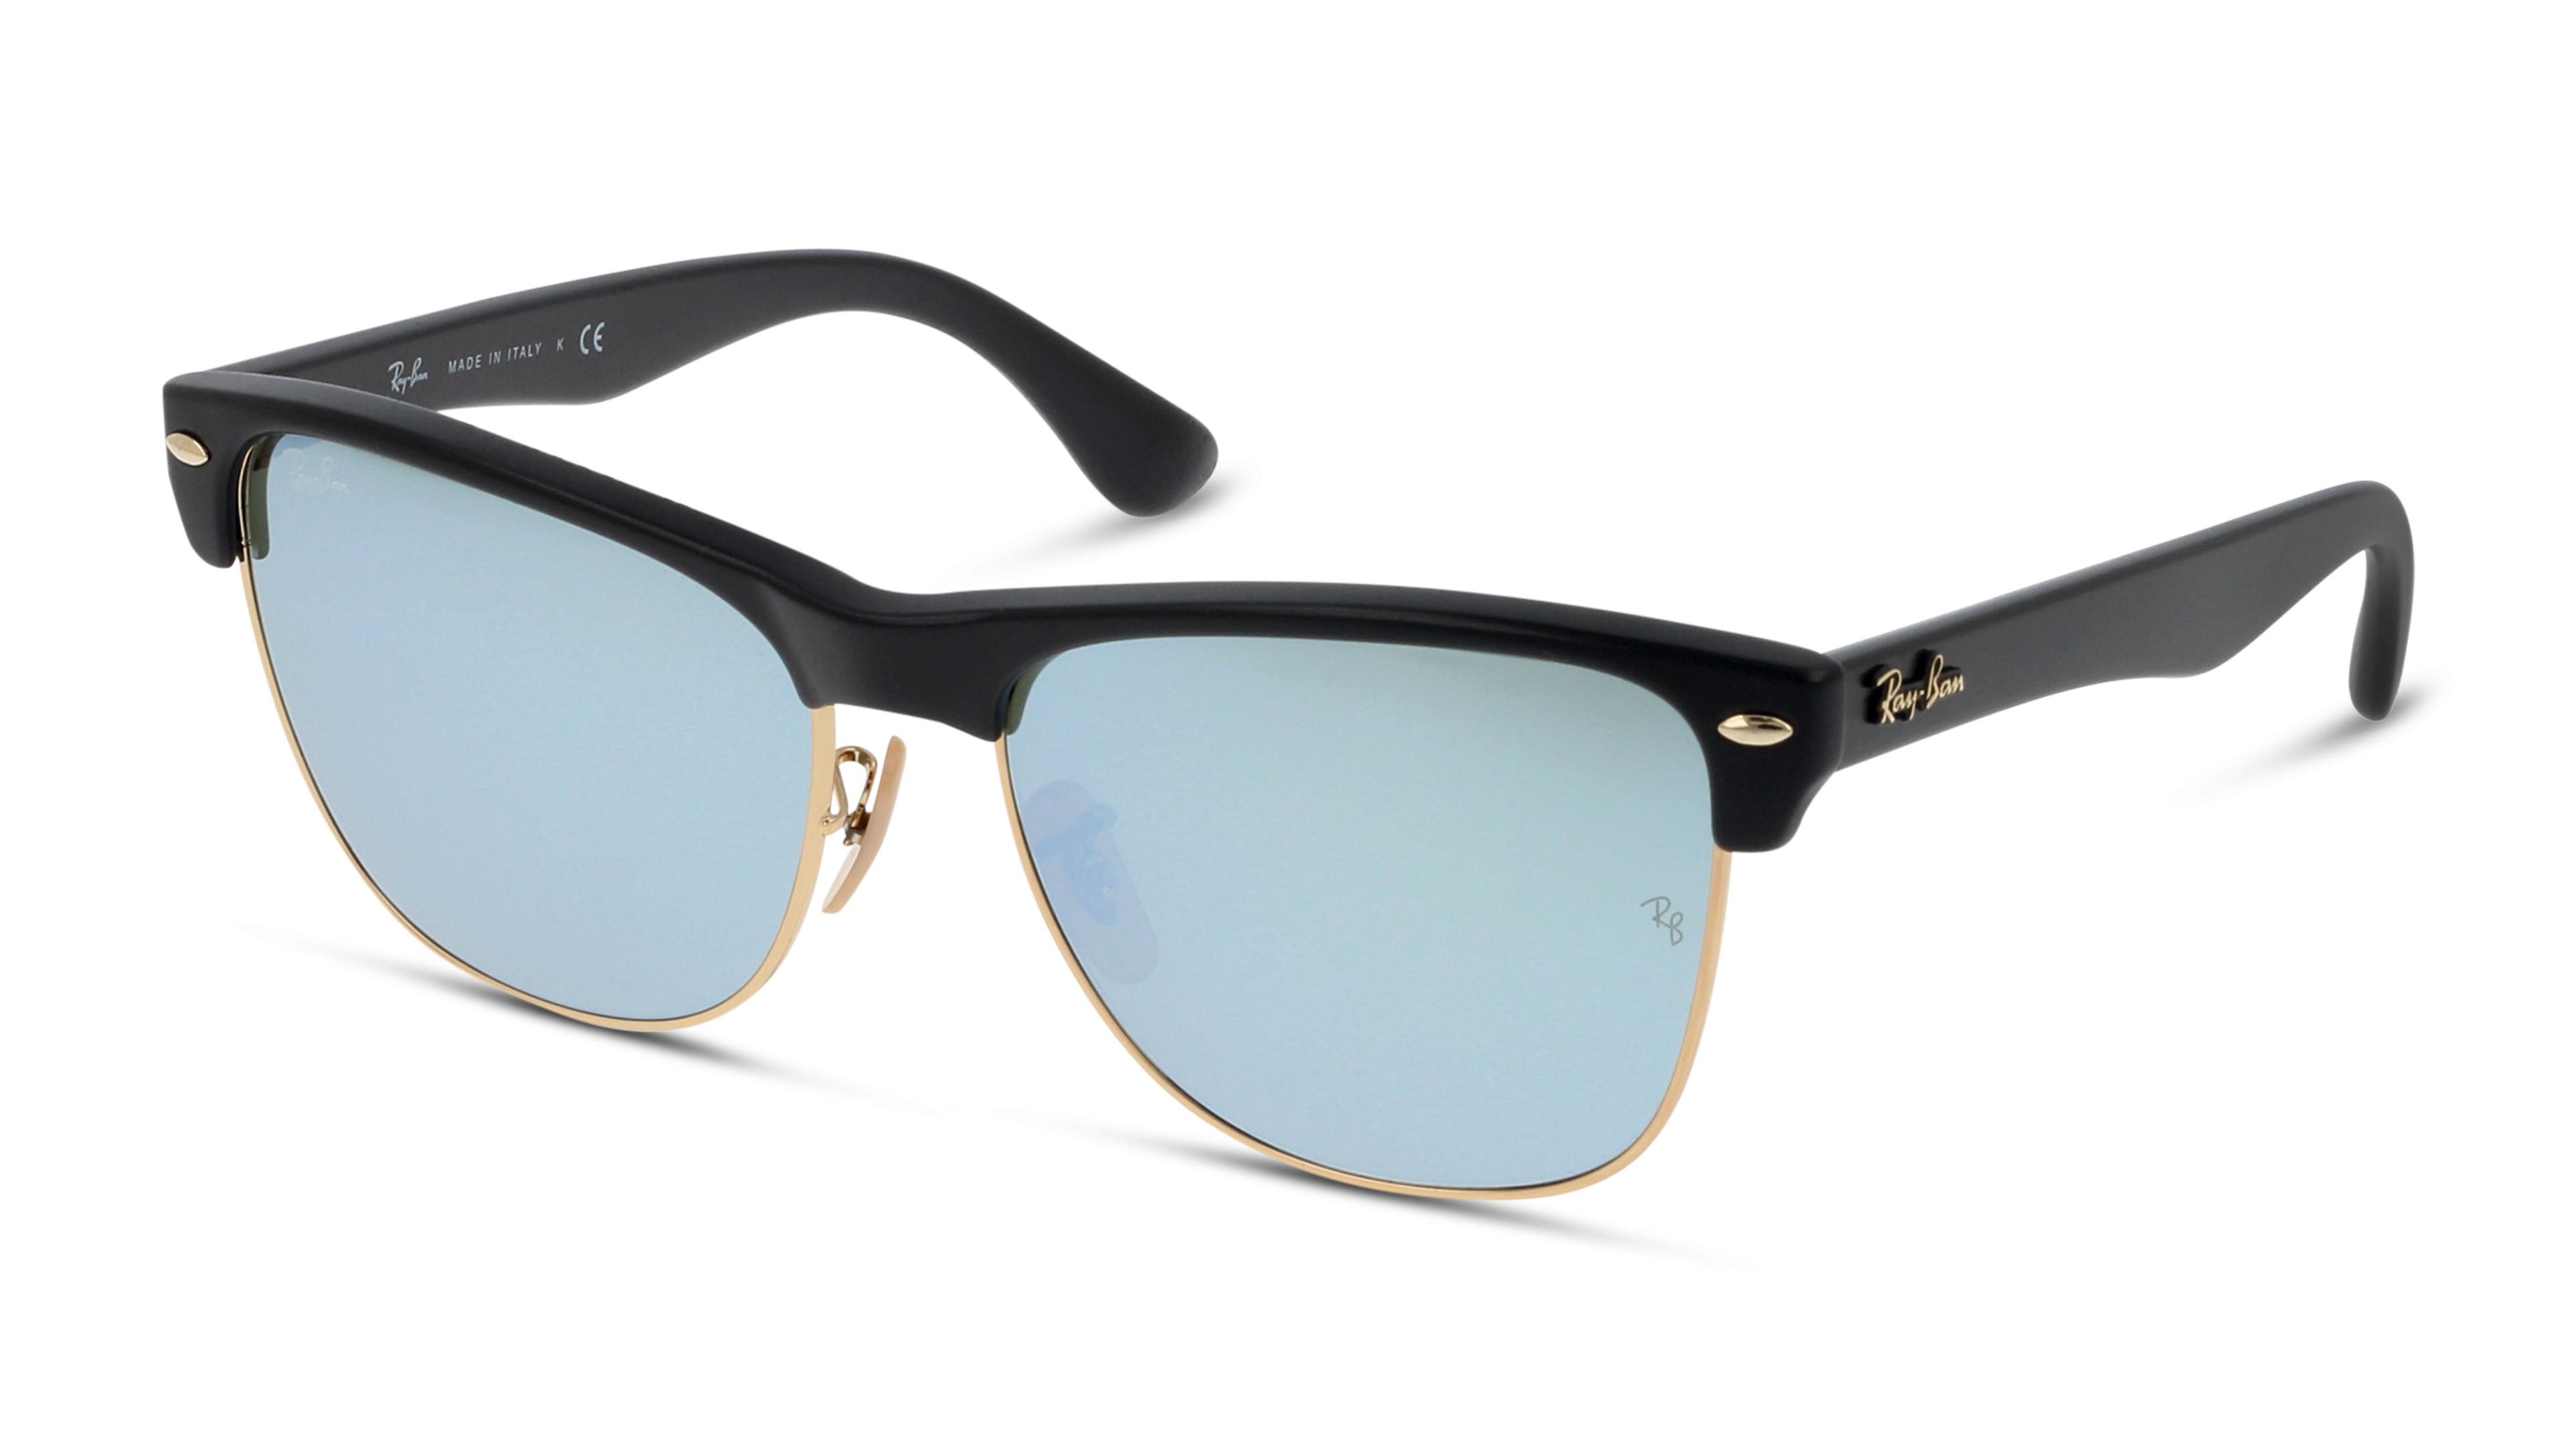 8053672436518-angle-01-rayban-glasses-eyewear-pair